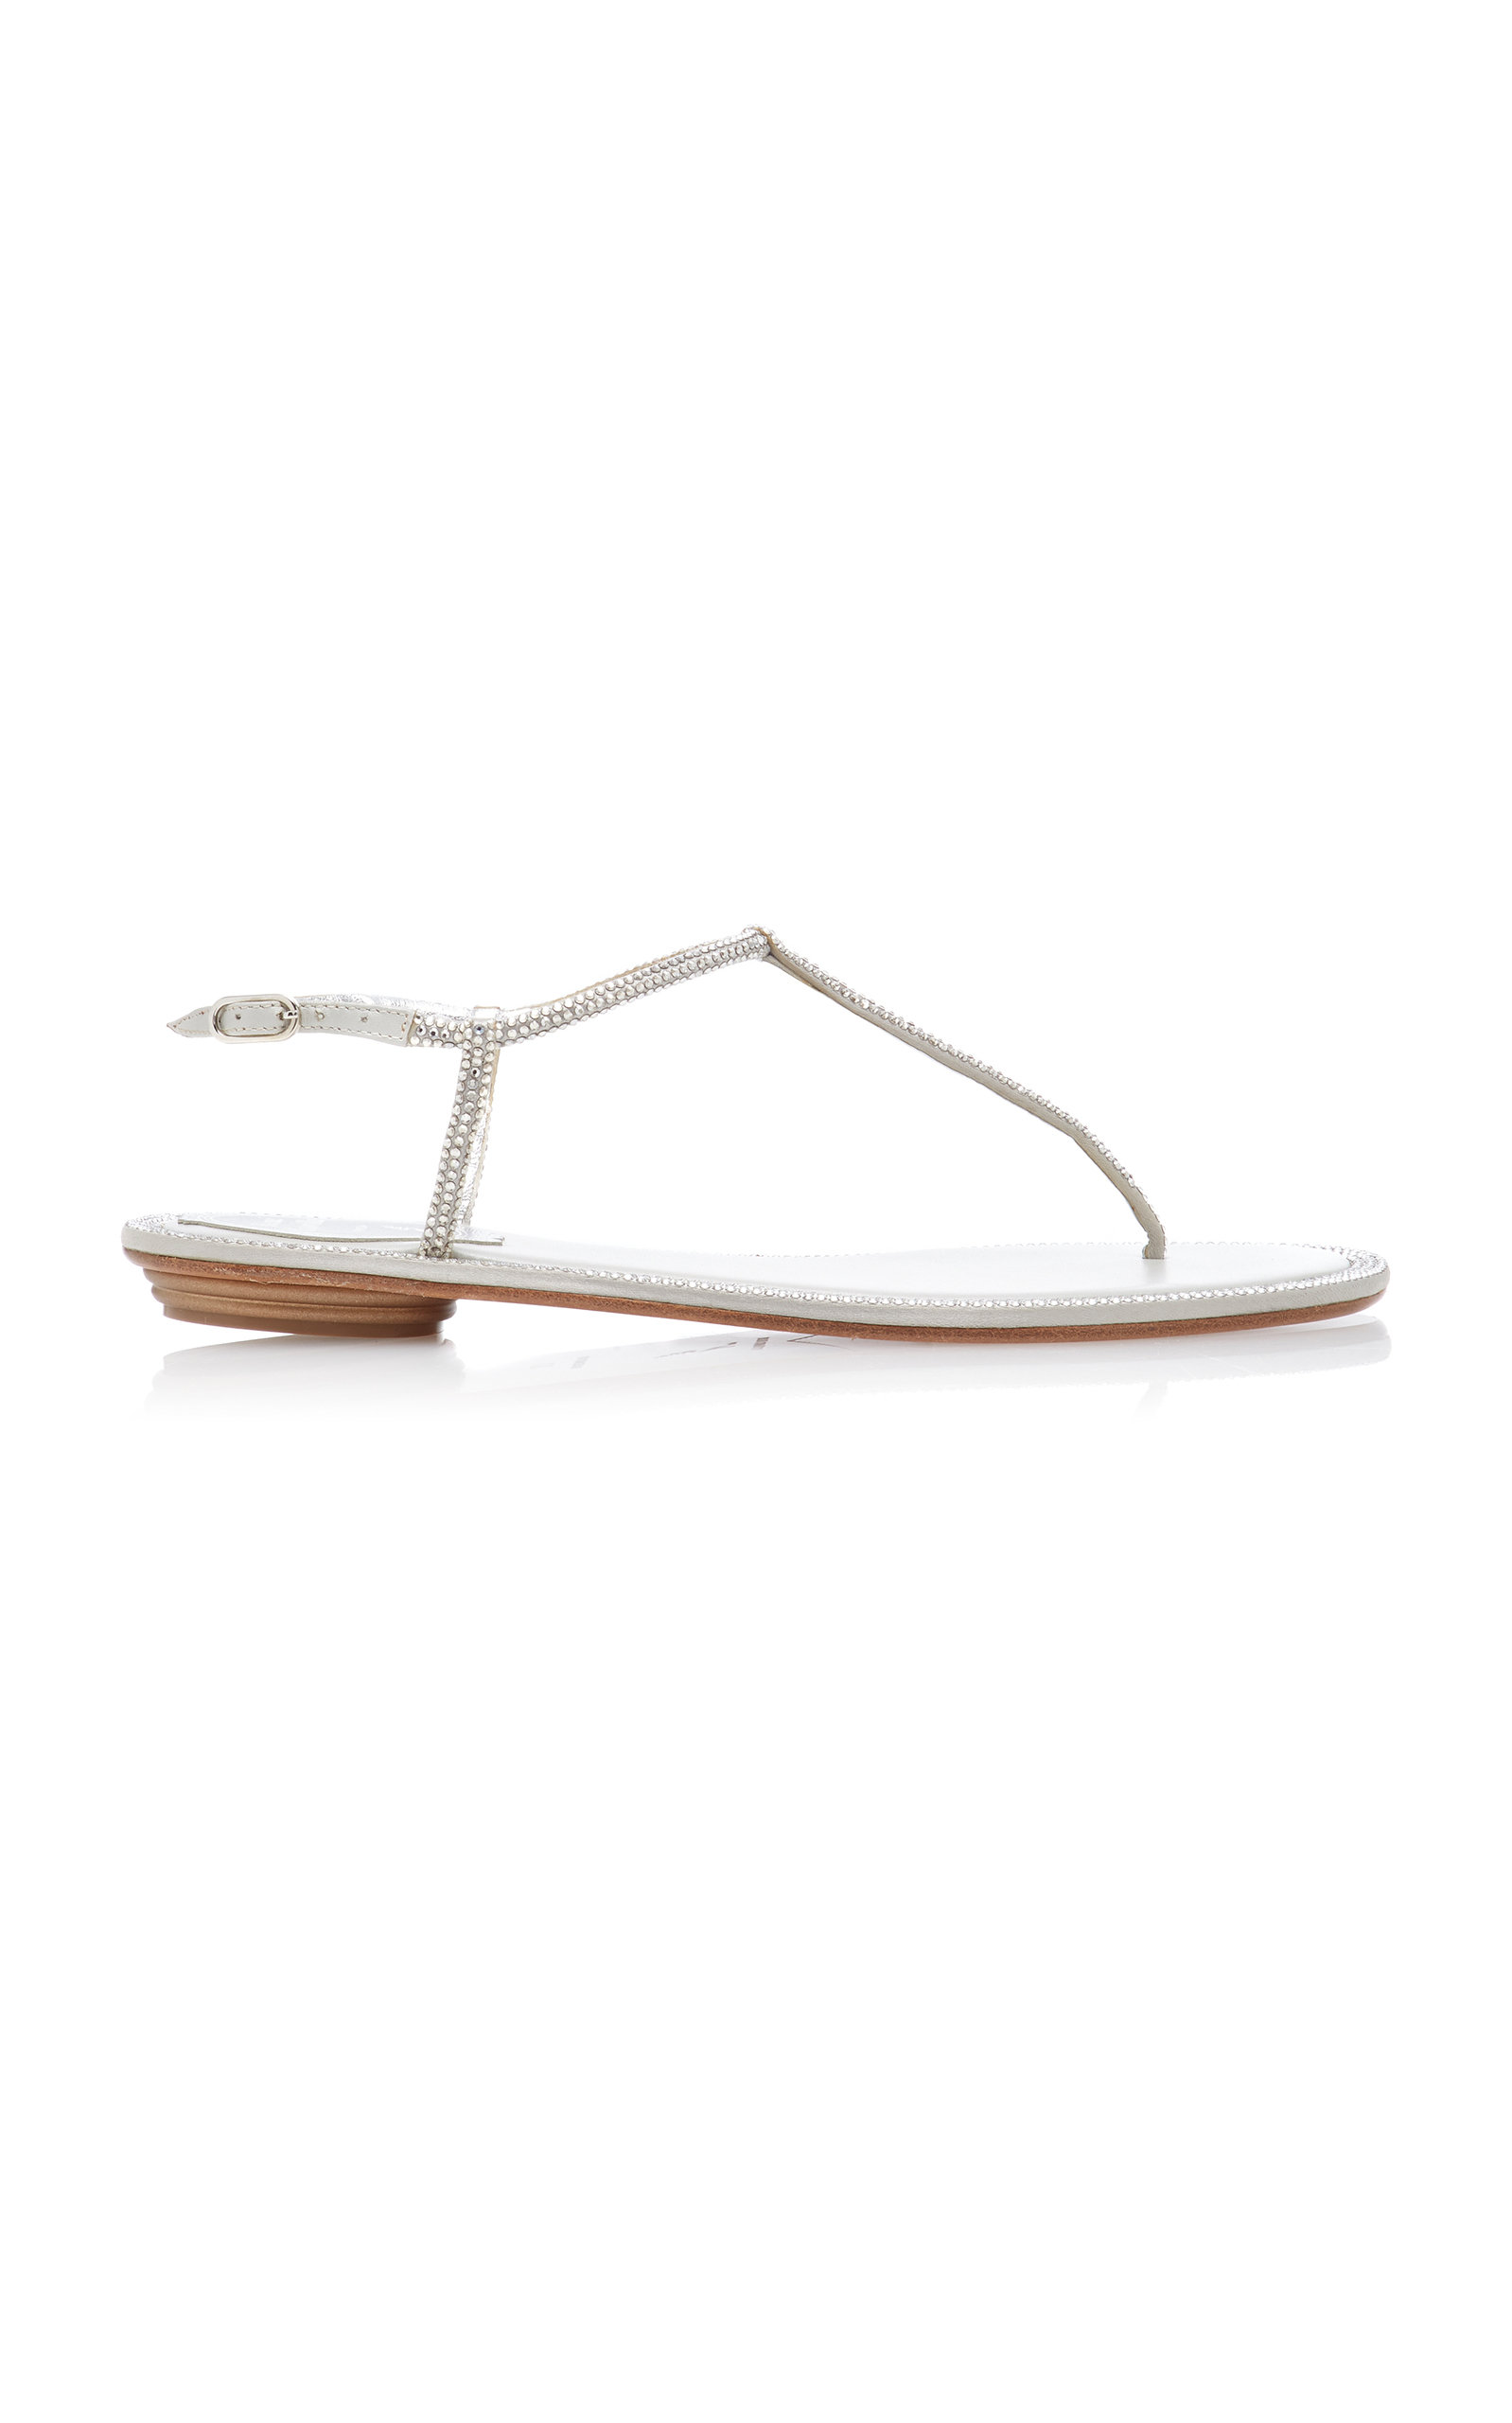 bb8d500245c8 RenÉ Caovilla Crystal-Embellished Satin Sandals In Silver